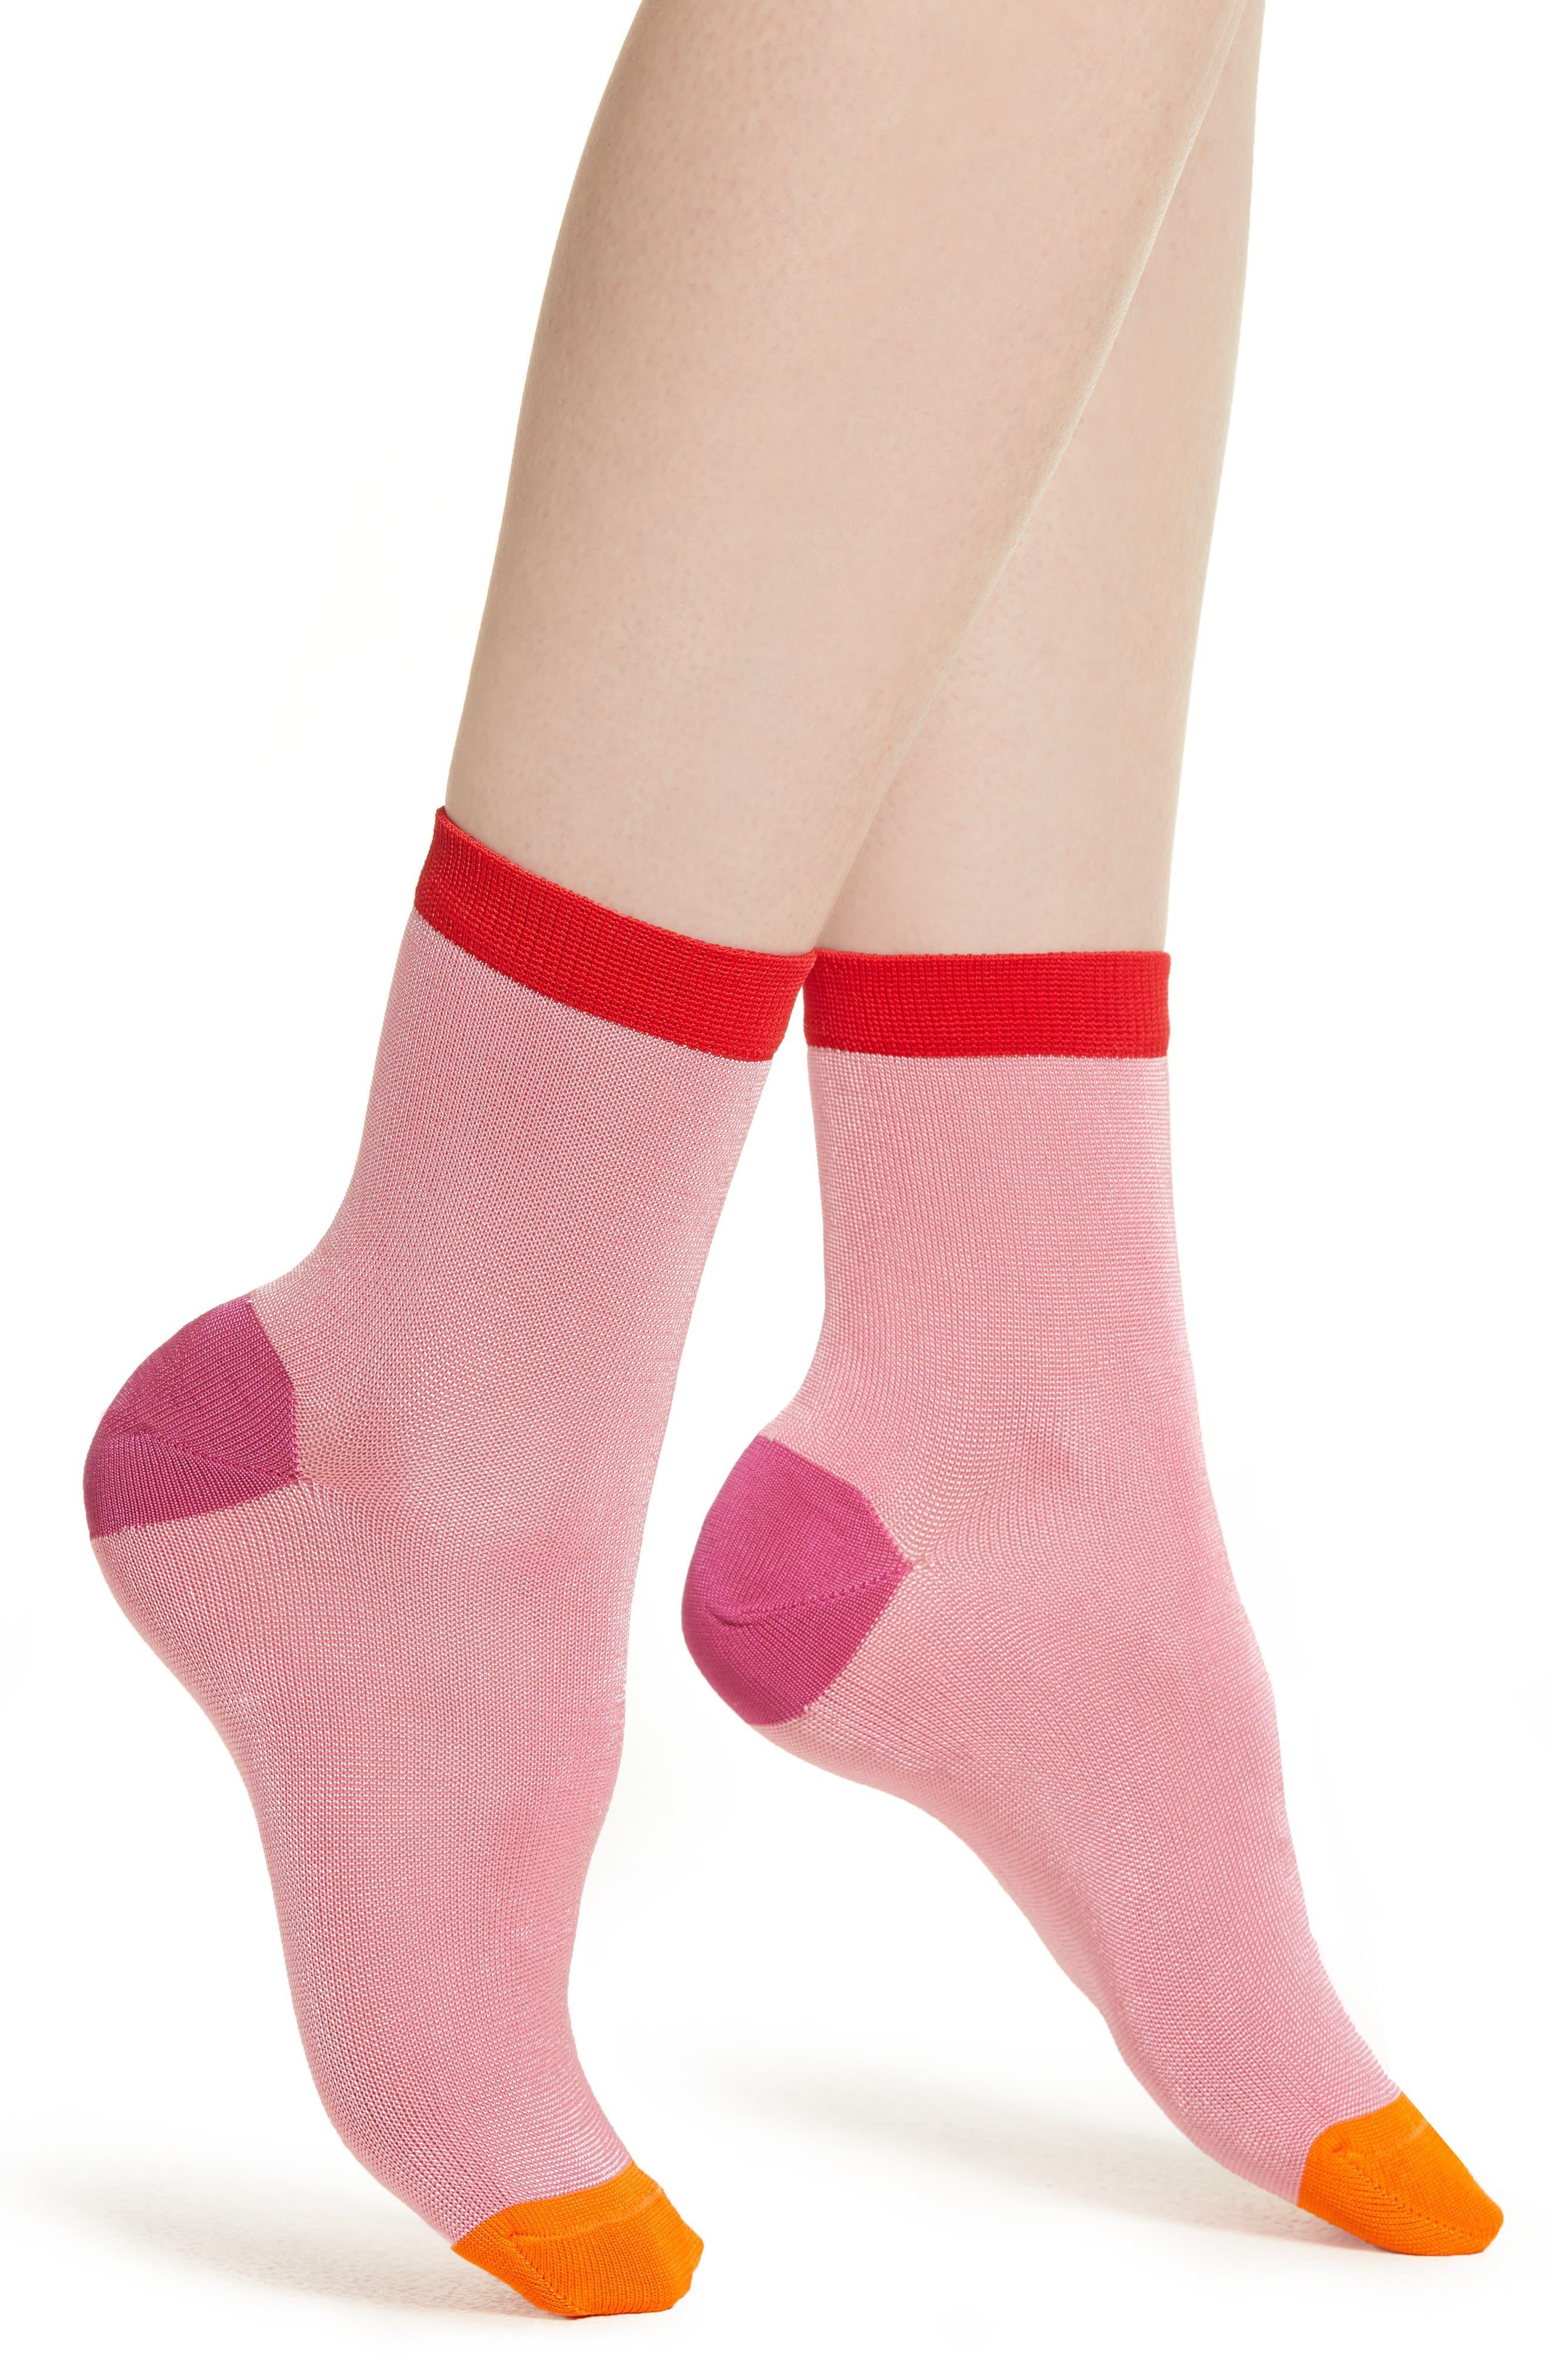 Grace Ankle Socks,                             Main thumbnail 1, color,                             LIGHT PASTEL PINK